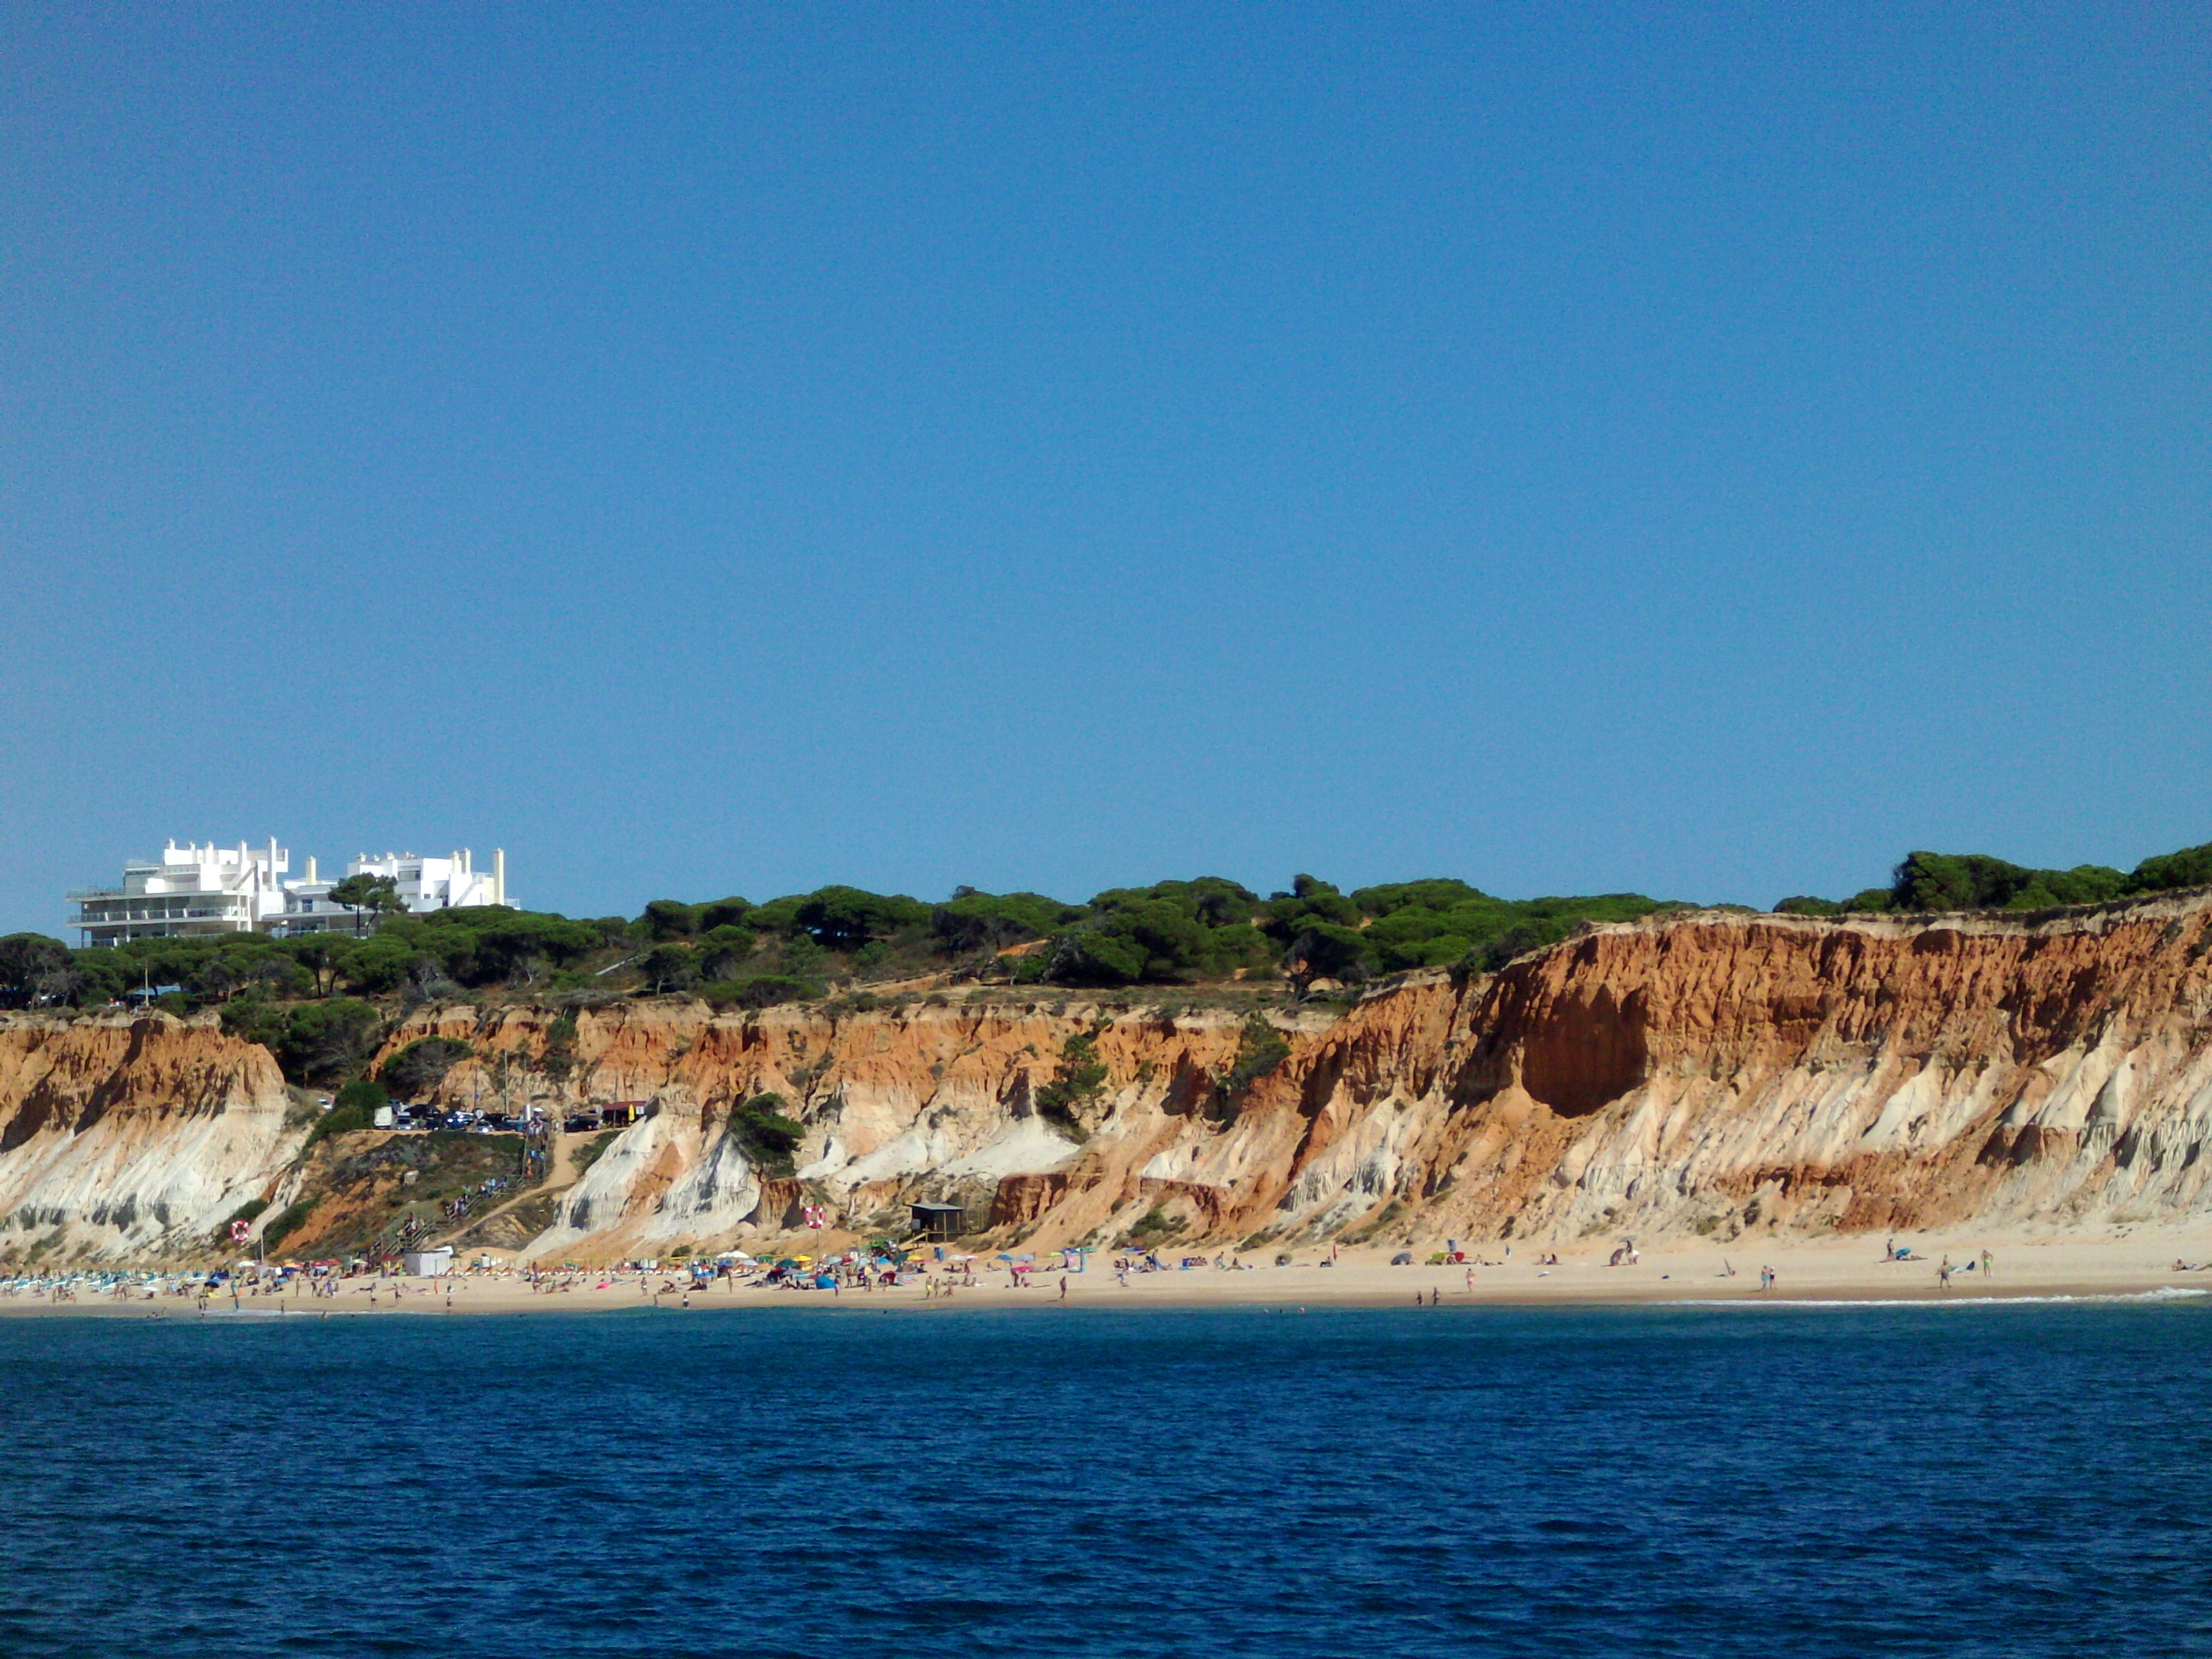 Praia da Falésia, Algarve / Wikimedia commons